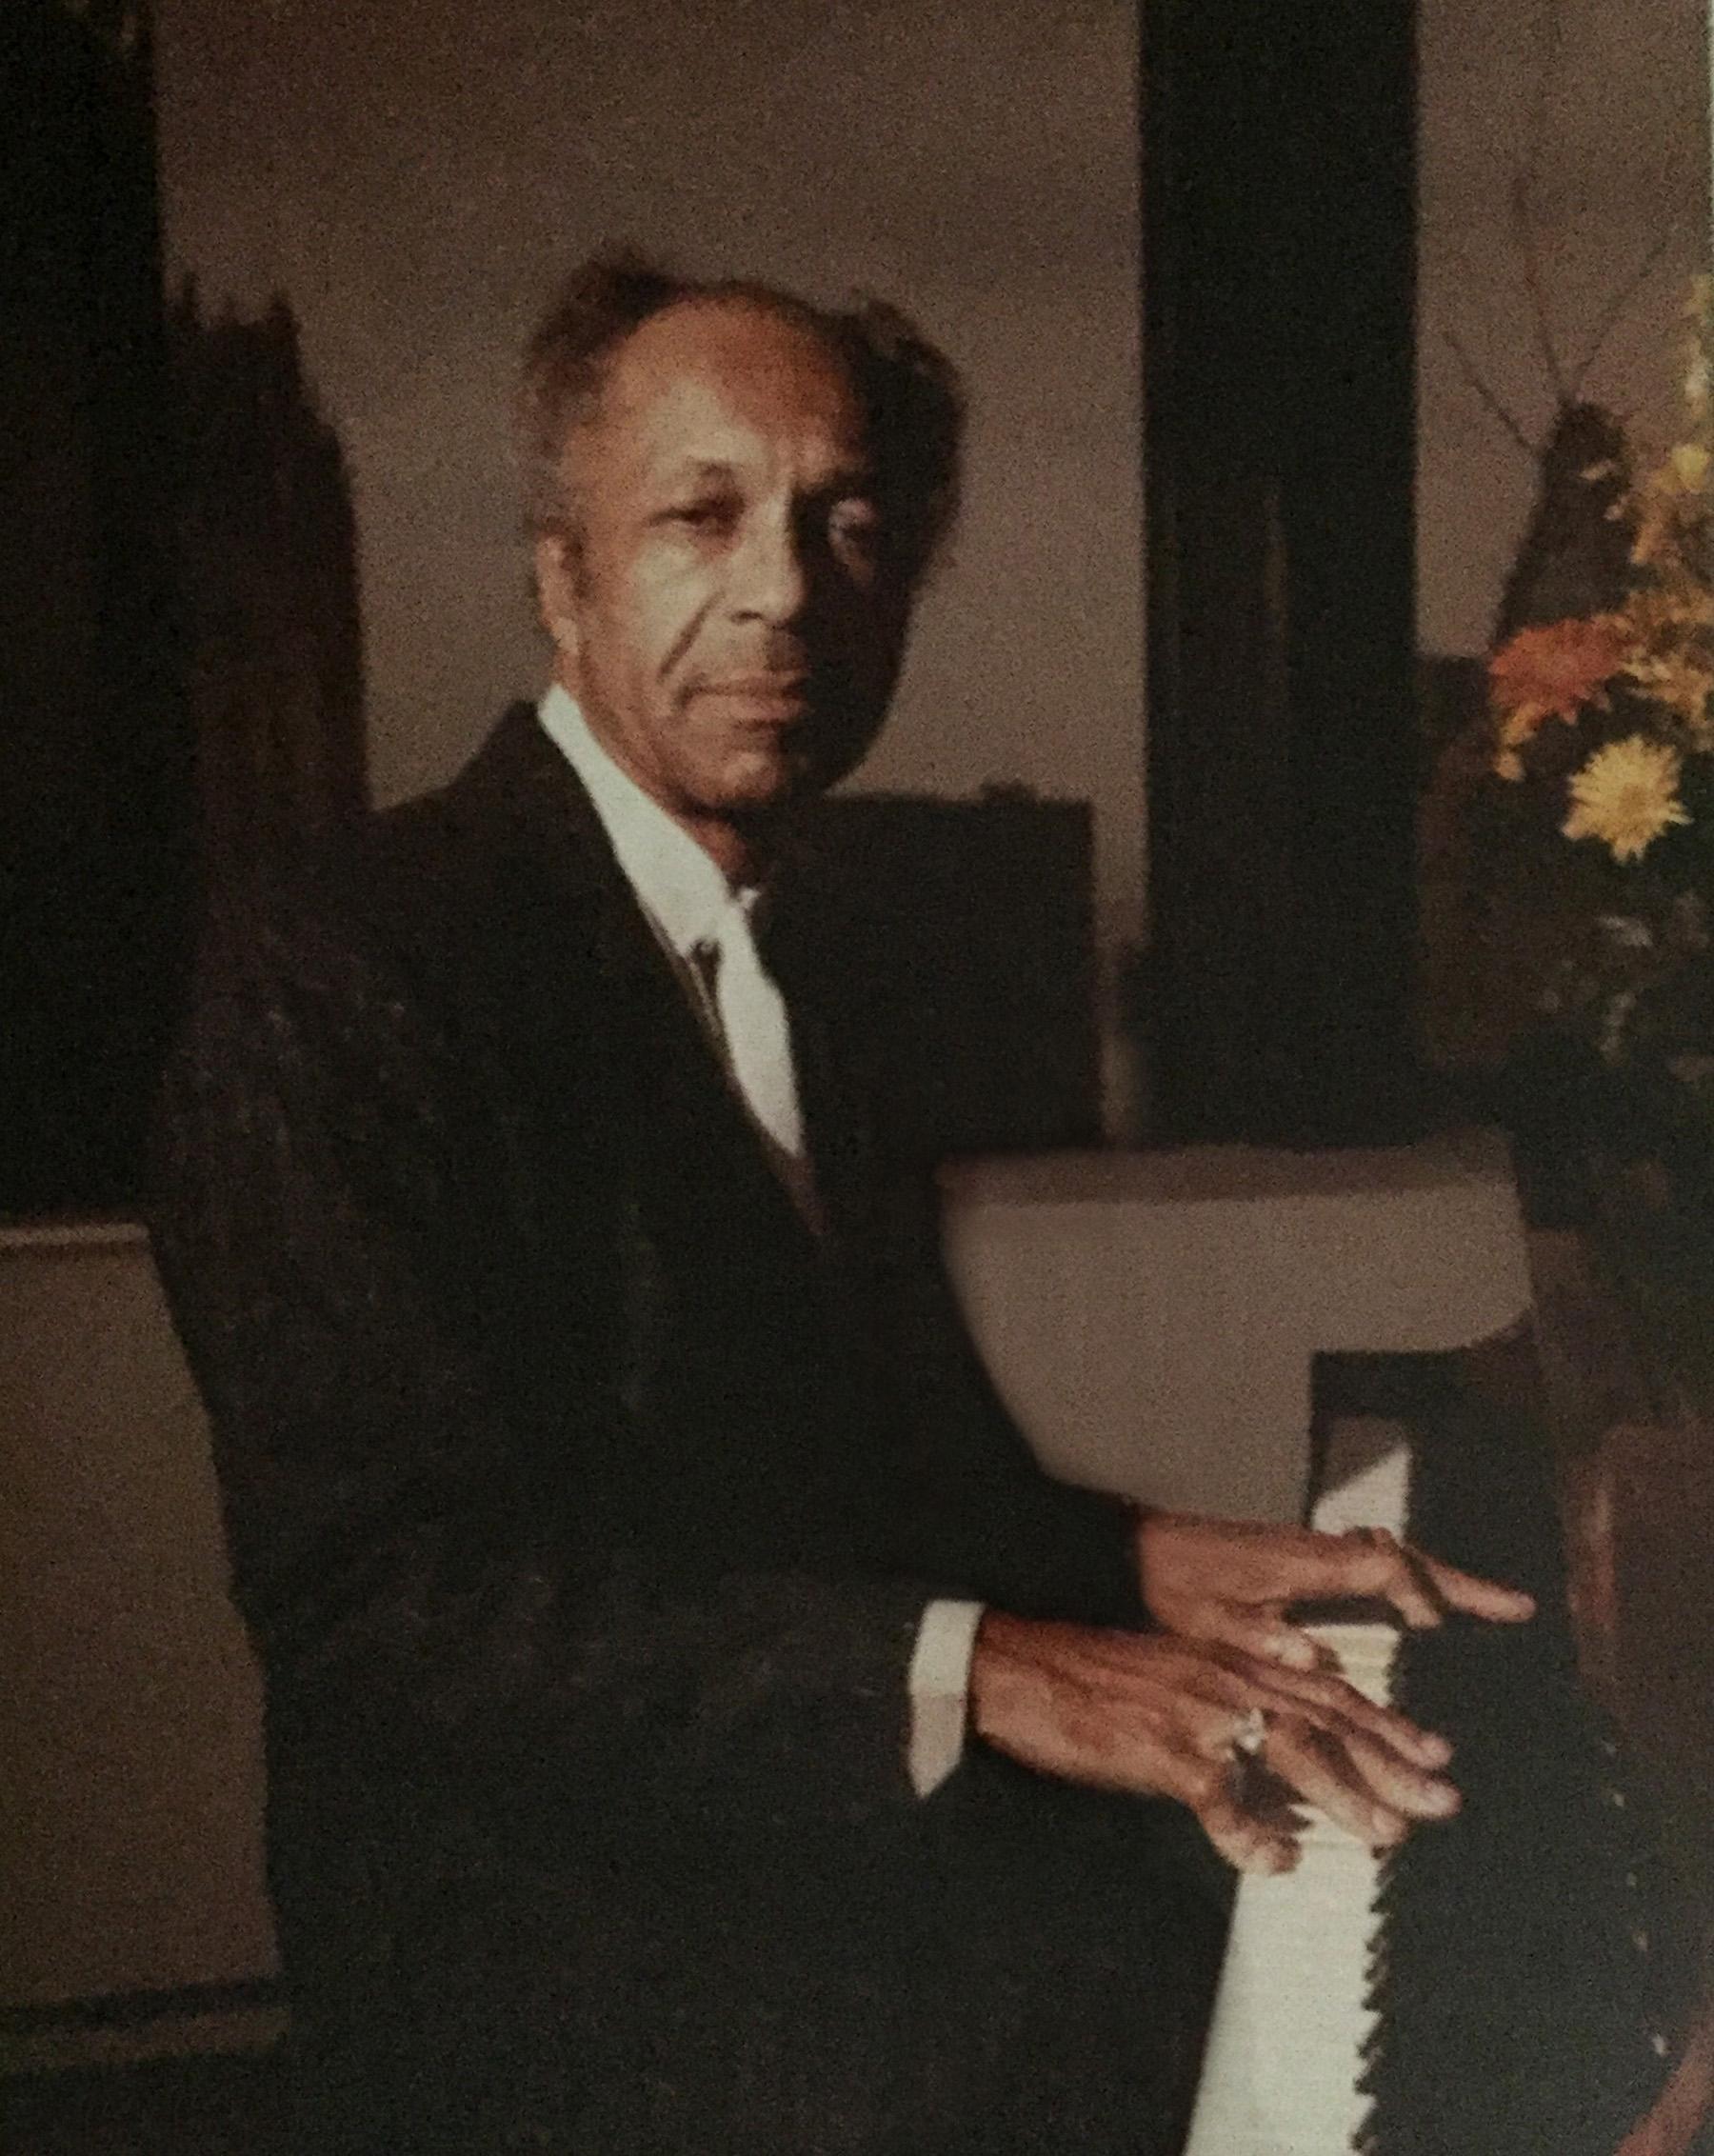 John L. Nelson